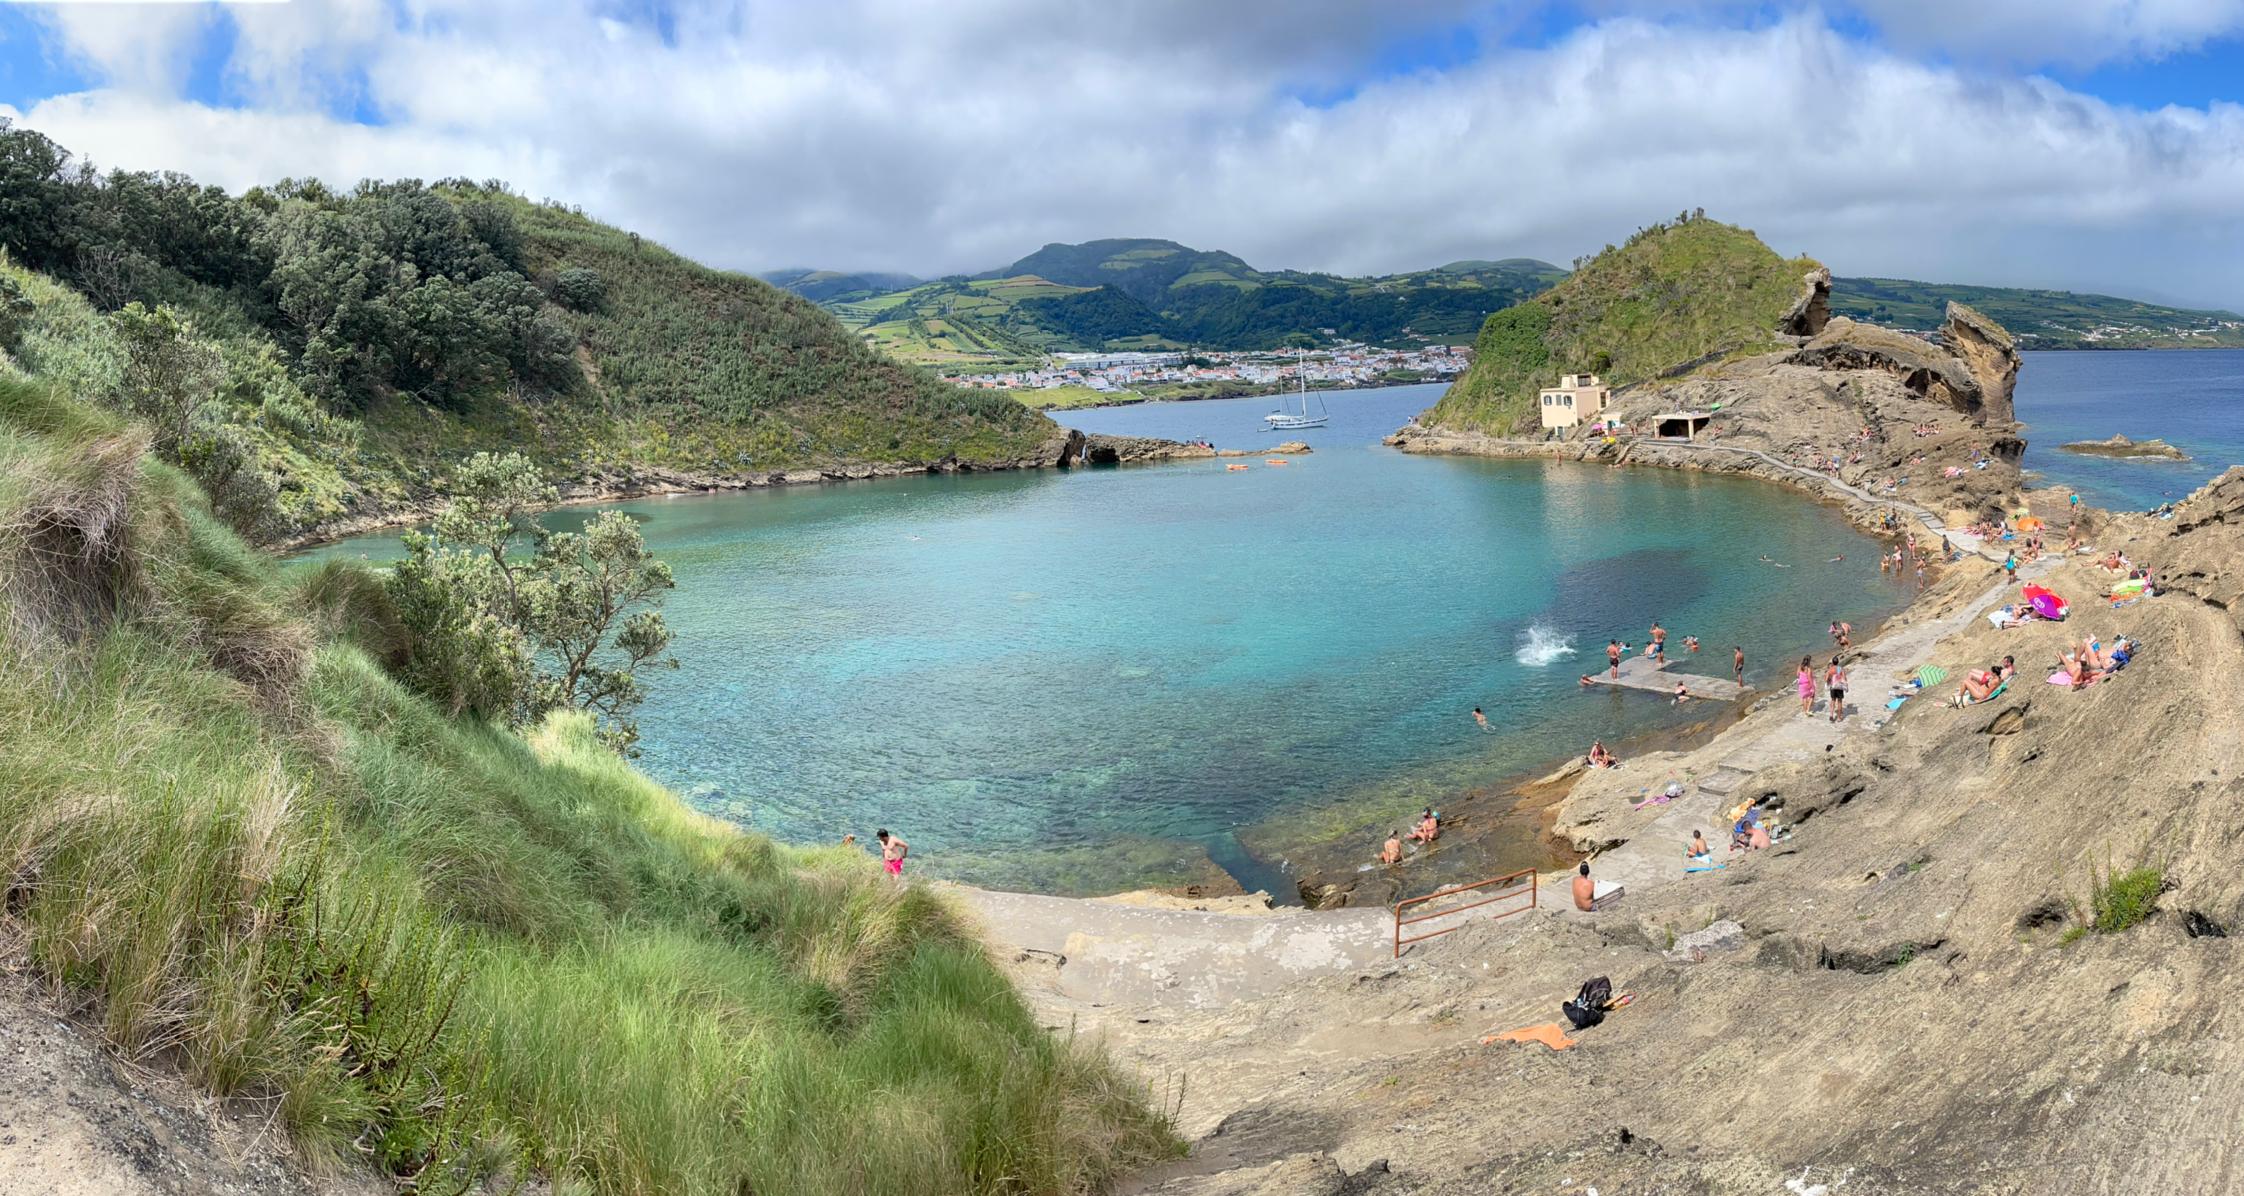 安利旅游地 — 葡属群岛 Azores